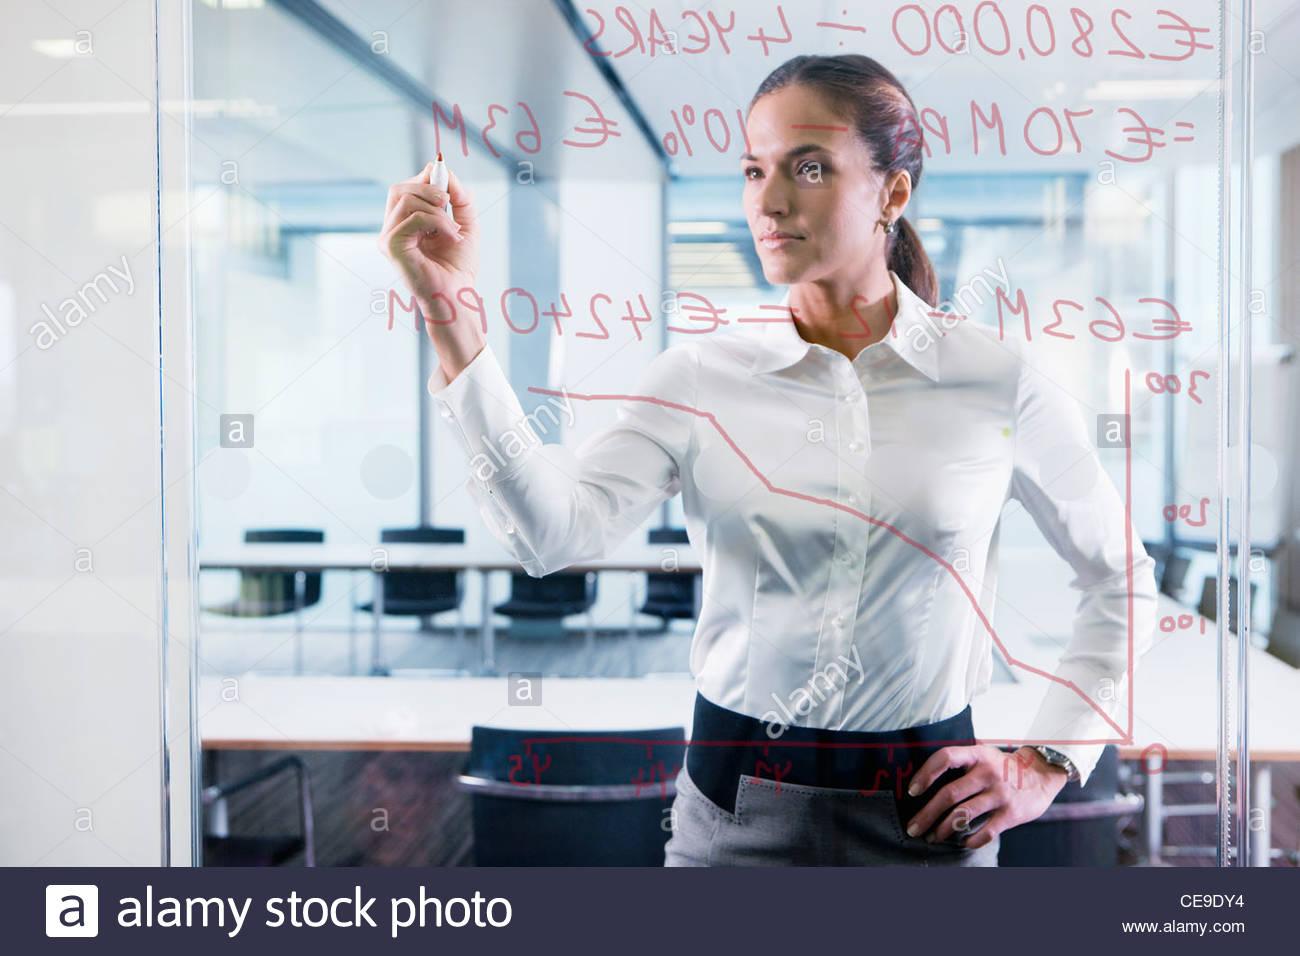 Imprenditrice disegno grafico sulla finestra in vetro in office Immagini Stock